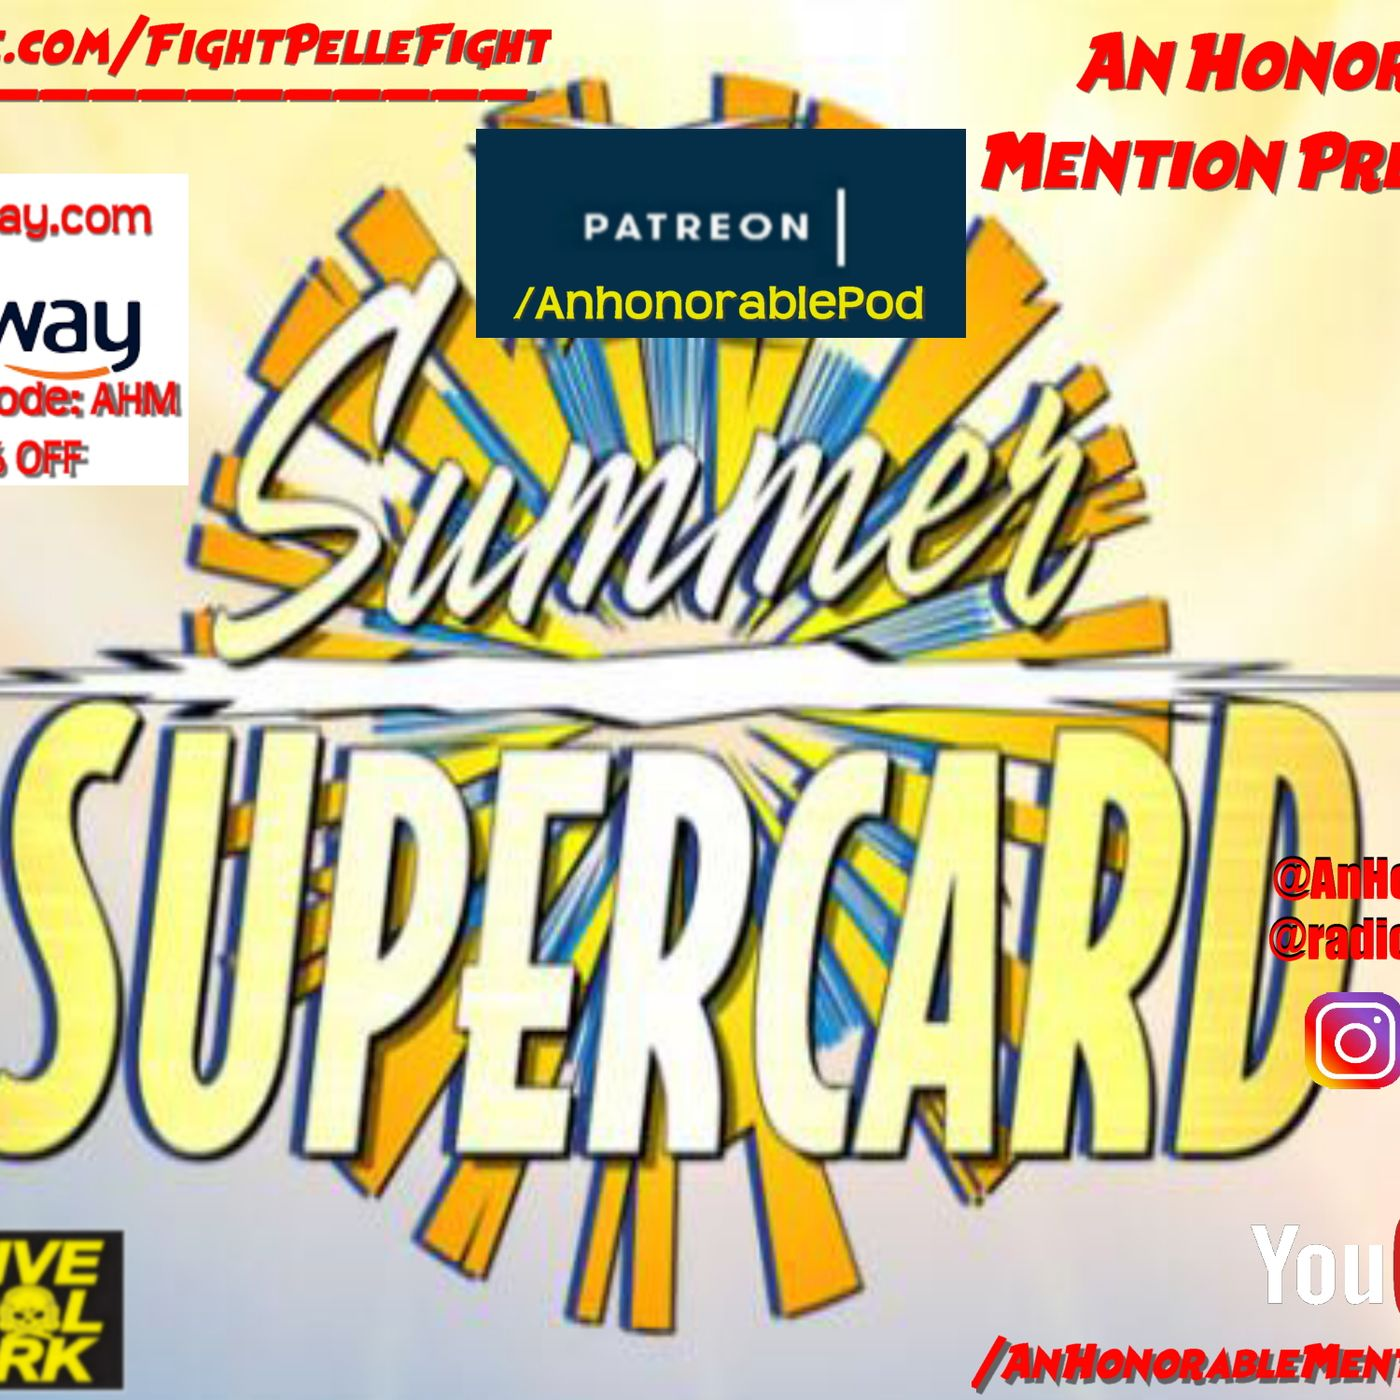 Episode 159: Summer Supercard 2019 (Presented by GetBellway.com & GoFundme.com/FightPelleFight)